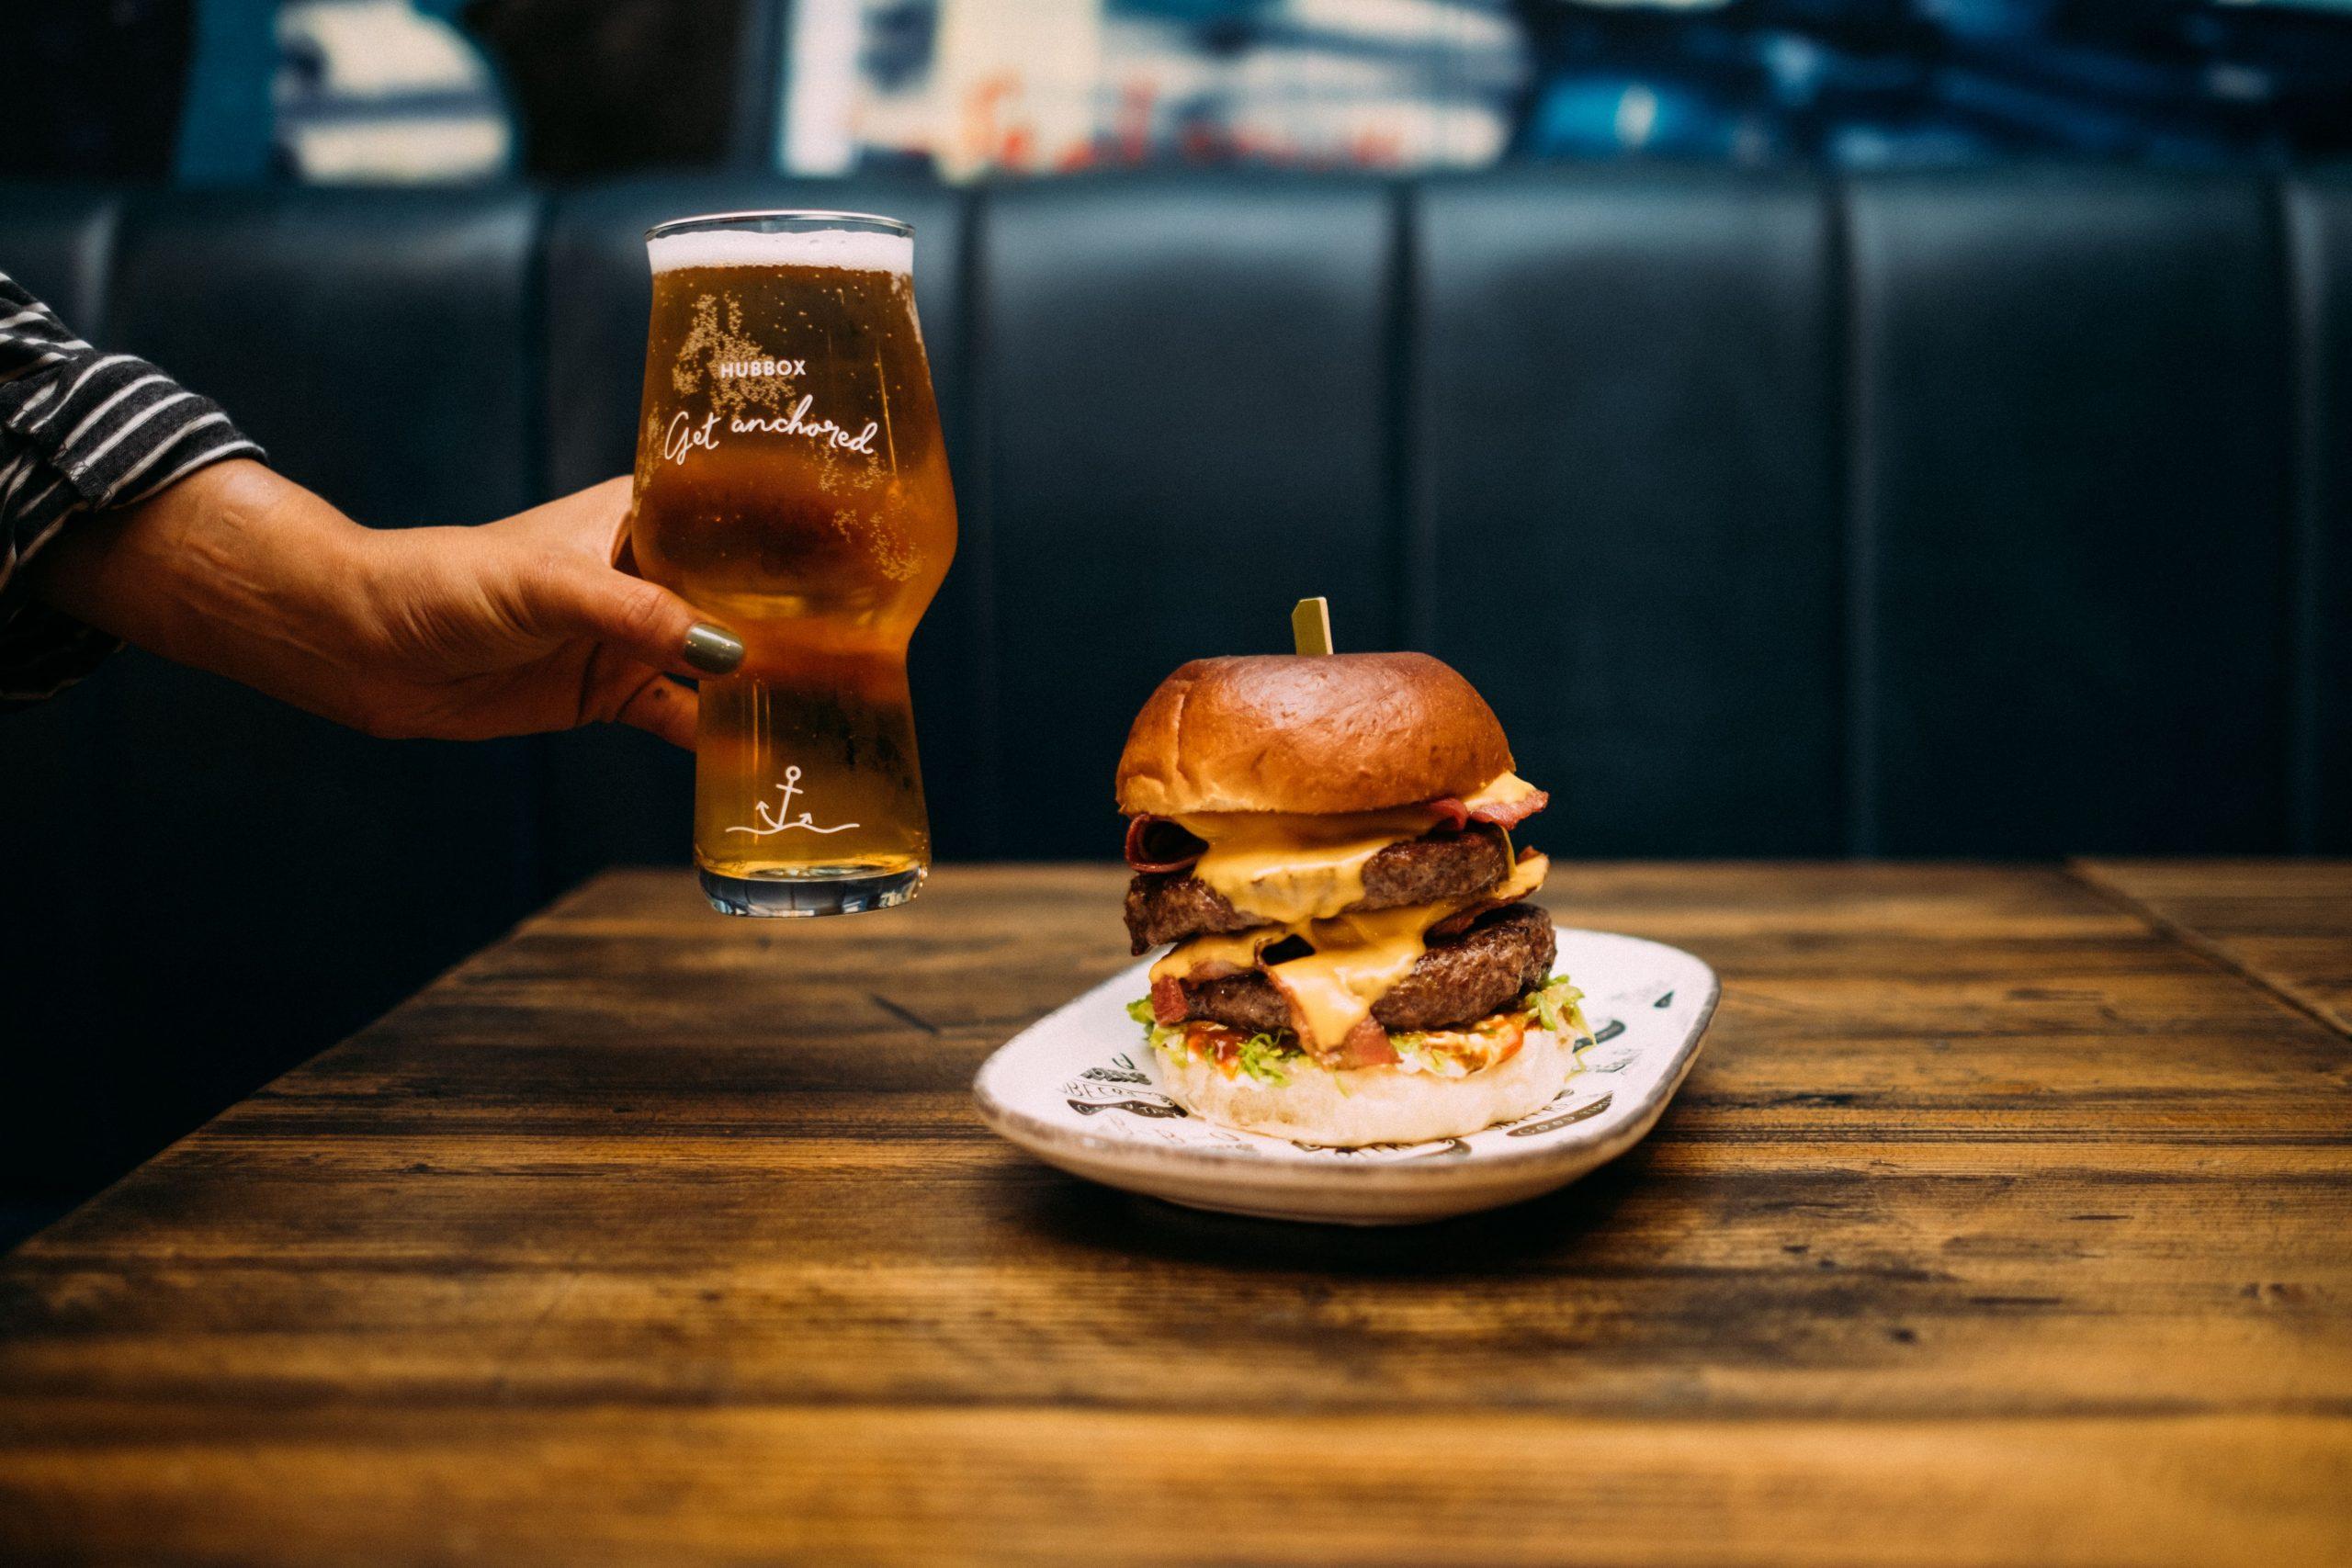 Hubbox Cardiff Burger